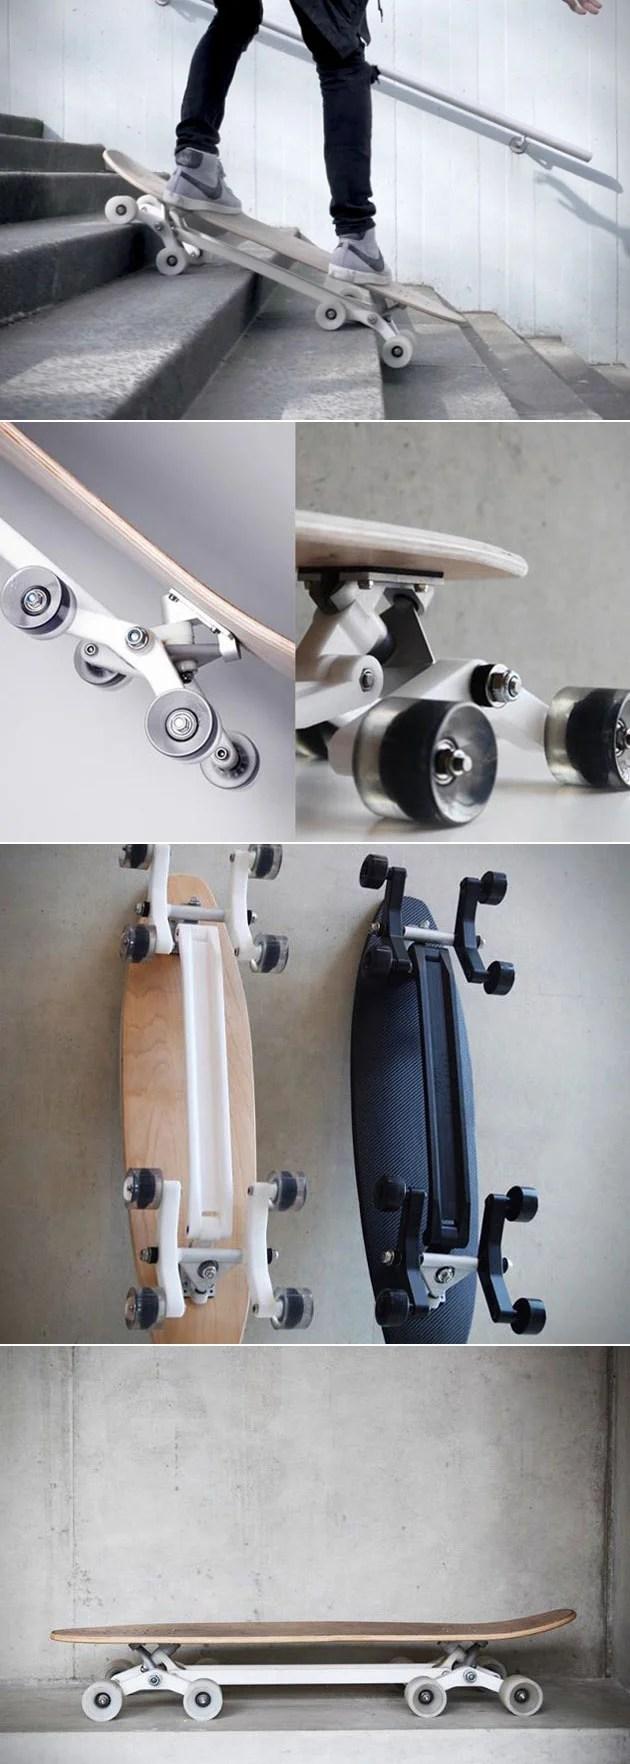 stair-rover-longboard